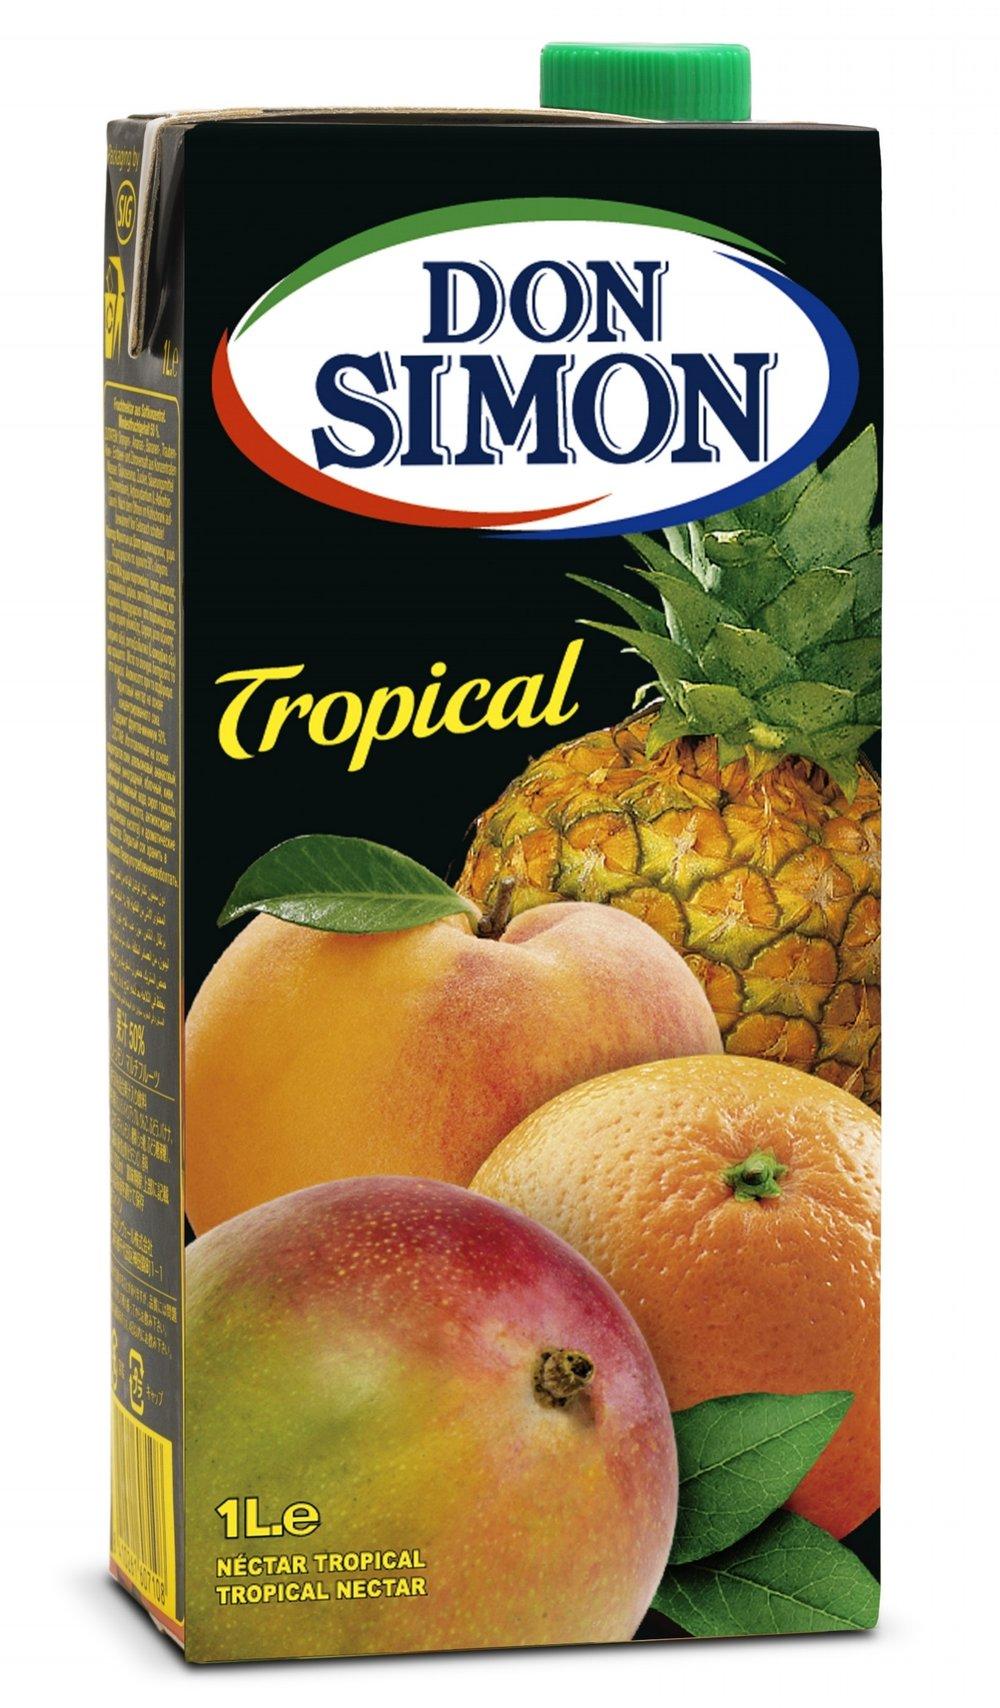 Nectar tropical